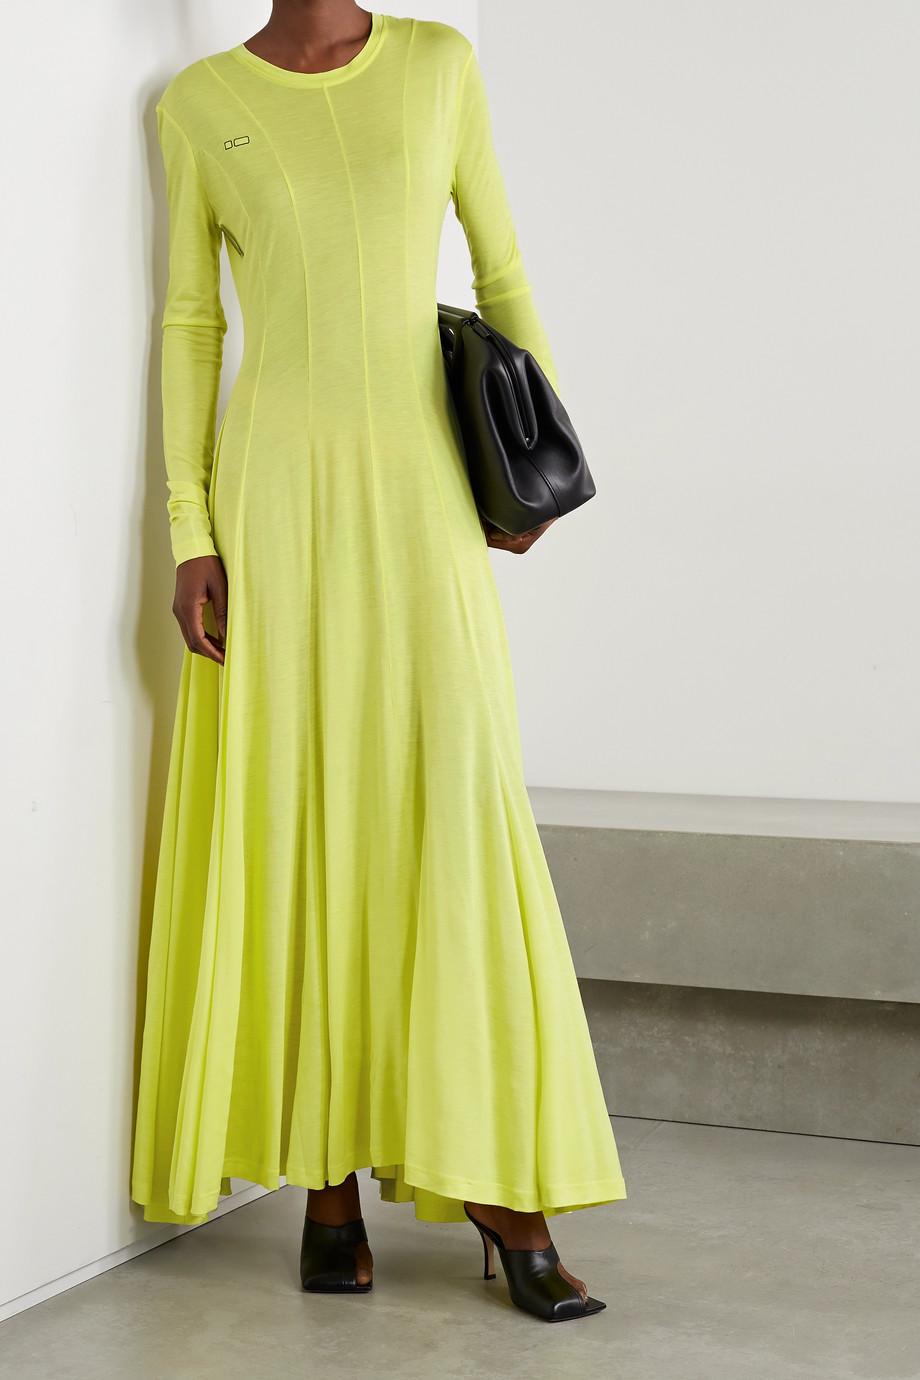 Peter Do Squid paneled TENCEL Lyocell maxi dress